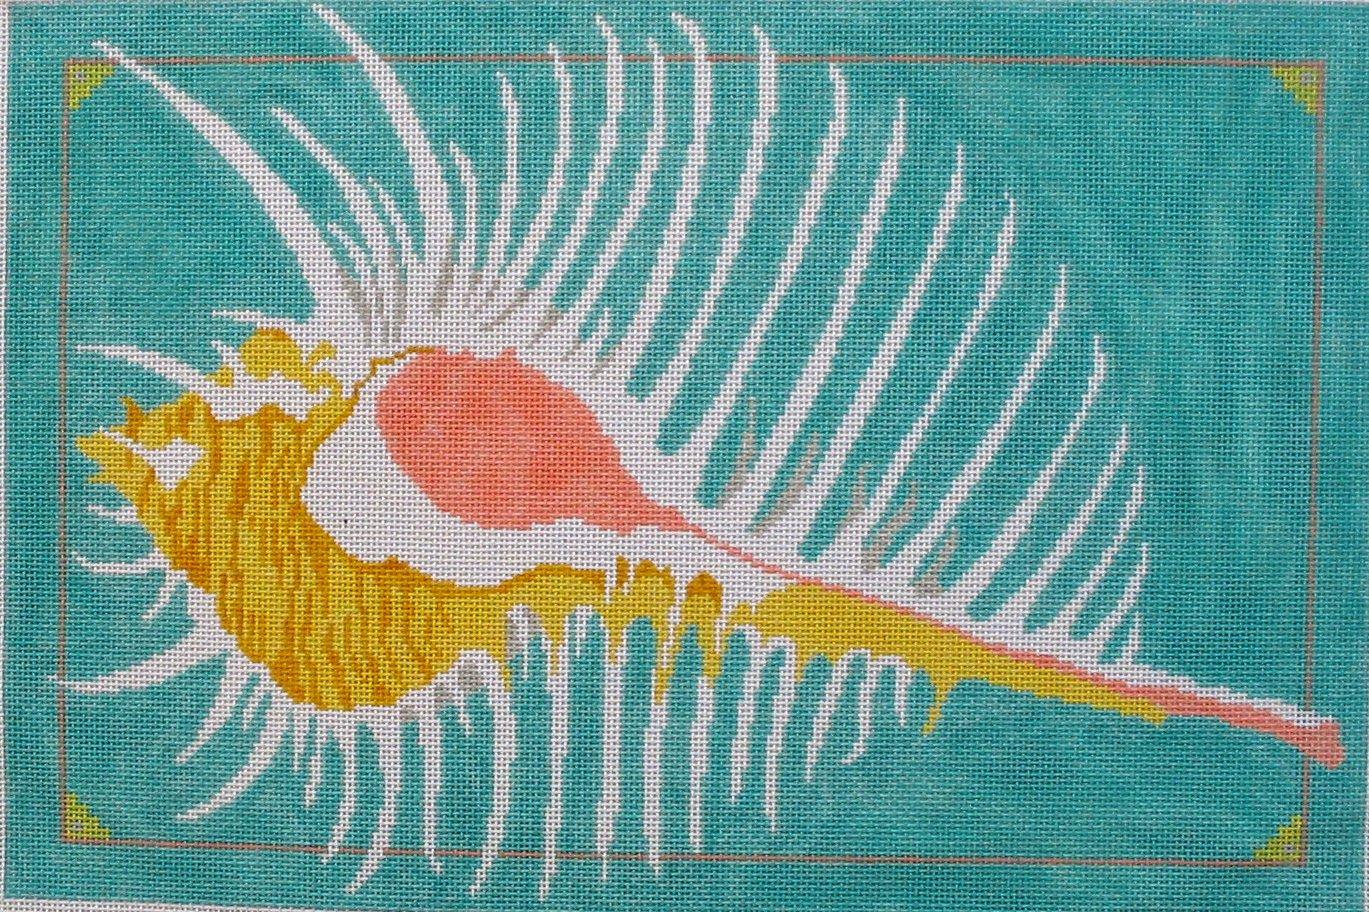 Venus Comb Murix